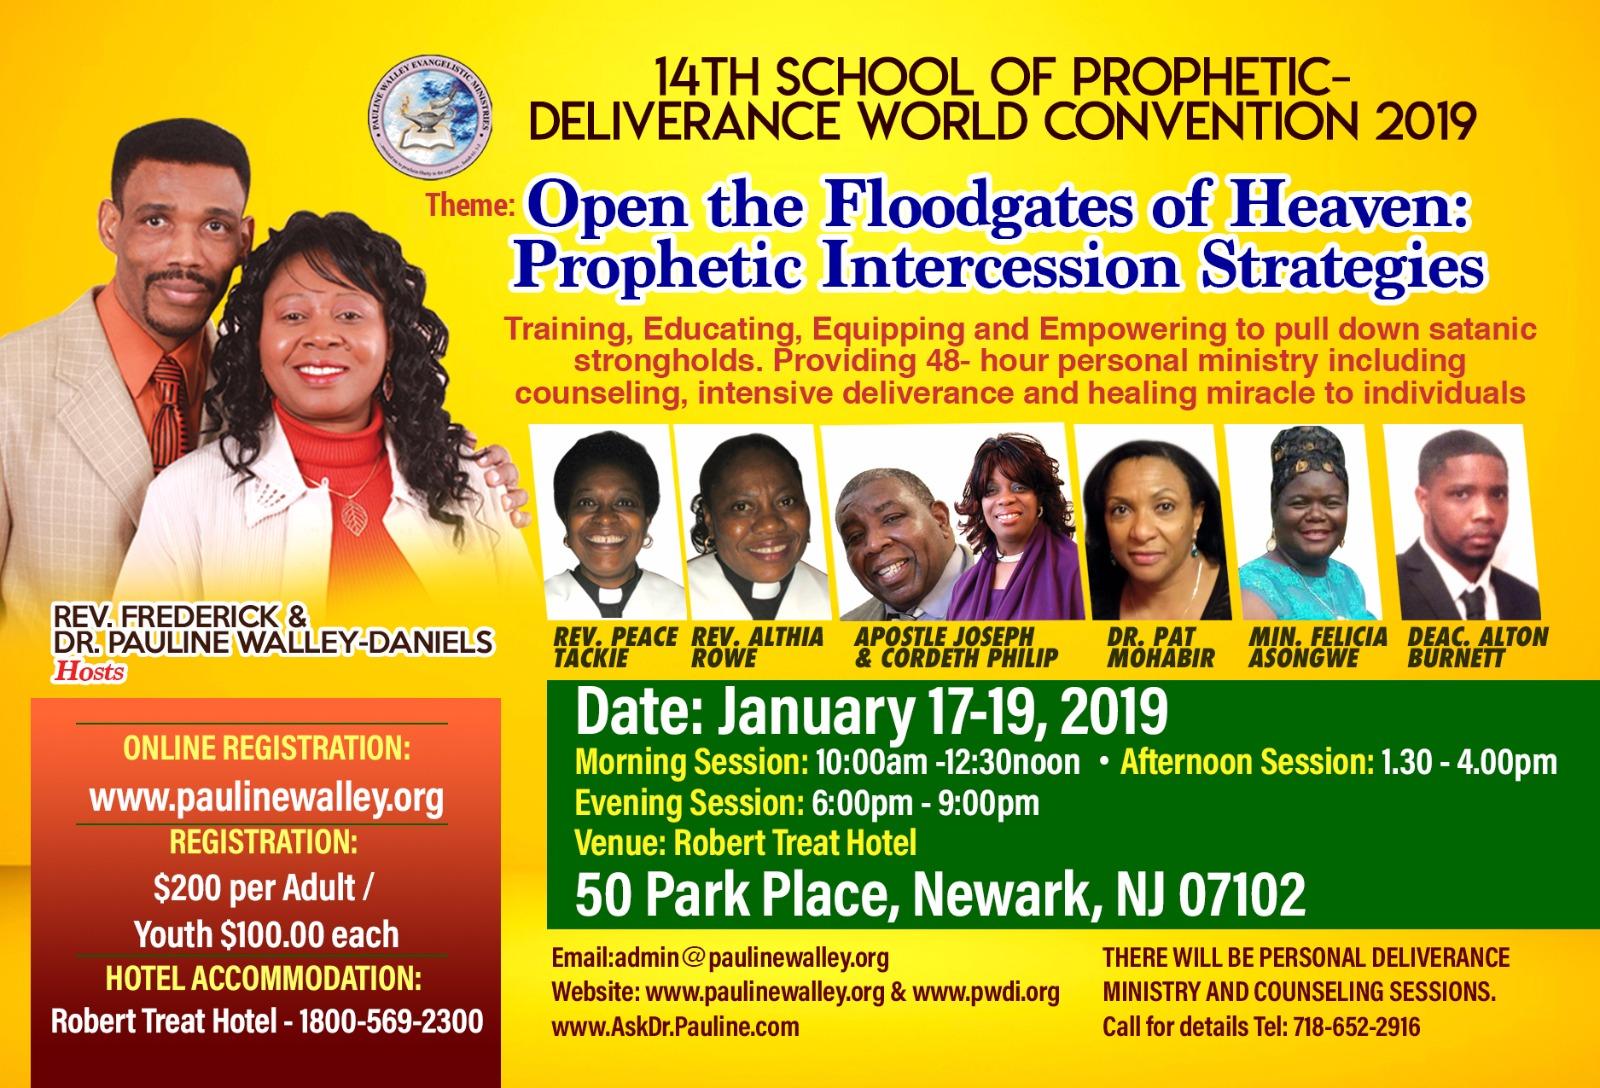 Open the Floodgates of Heaven: Prophetic Intercession Strategies